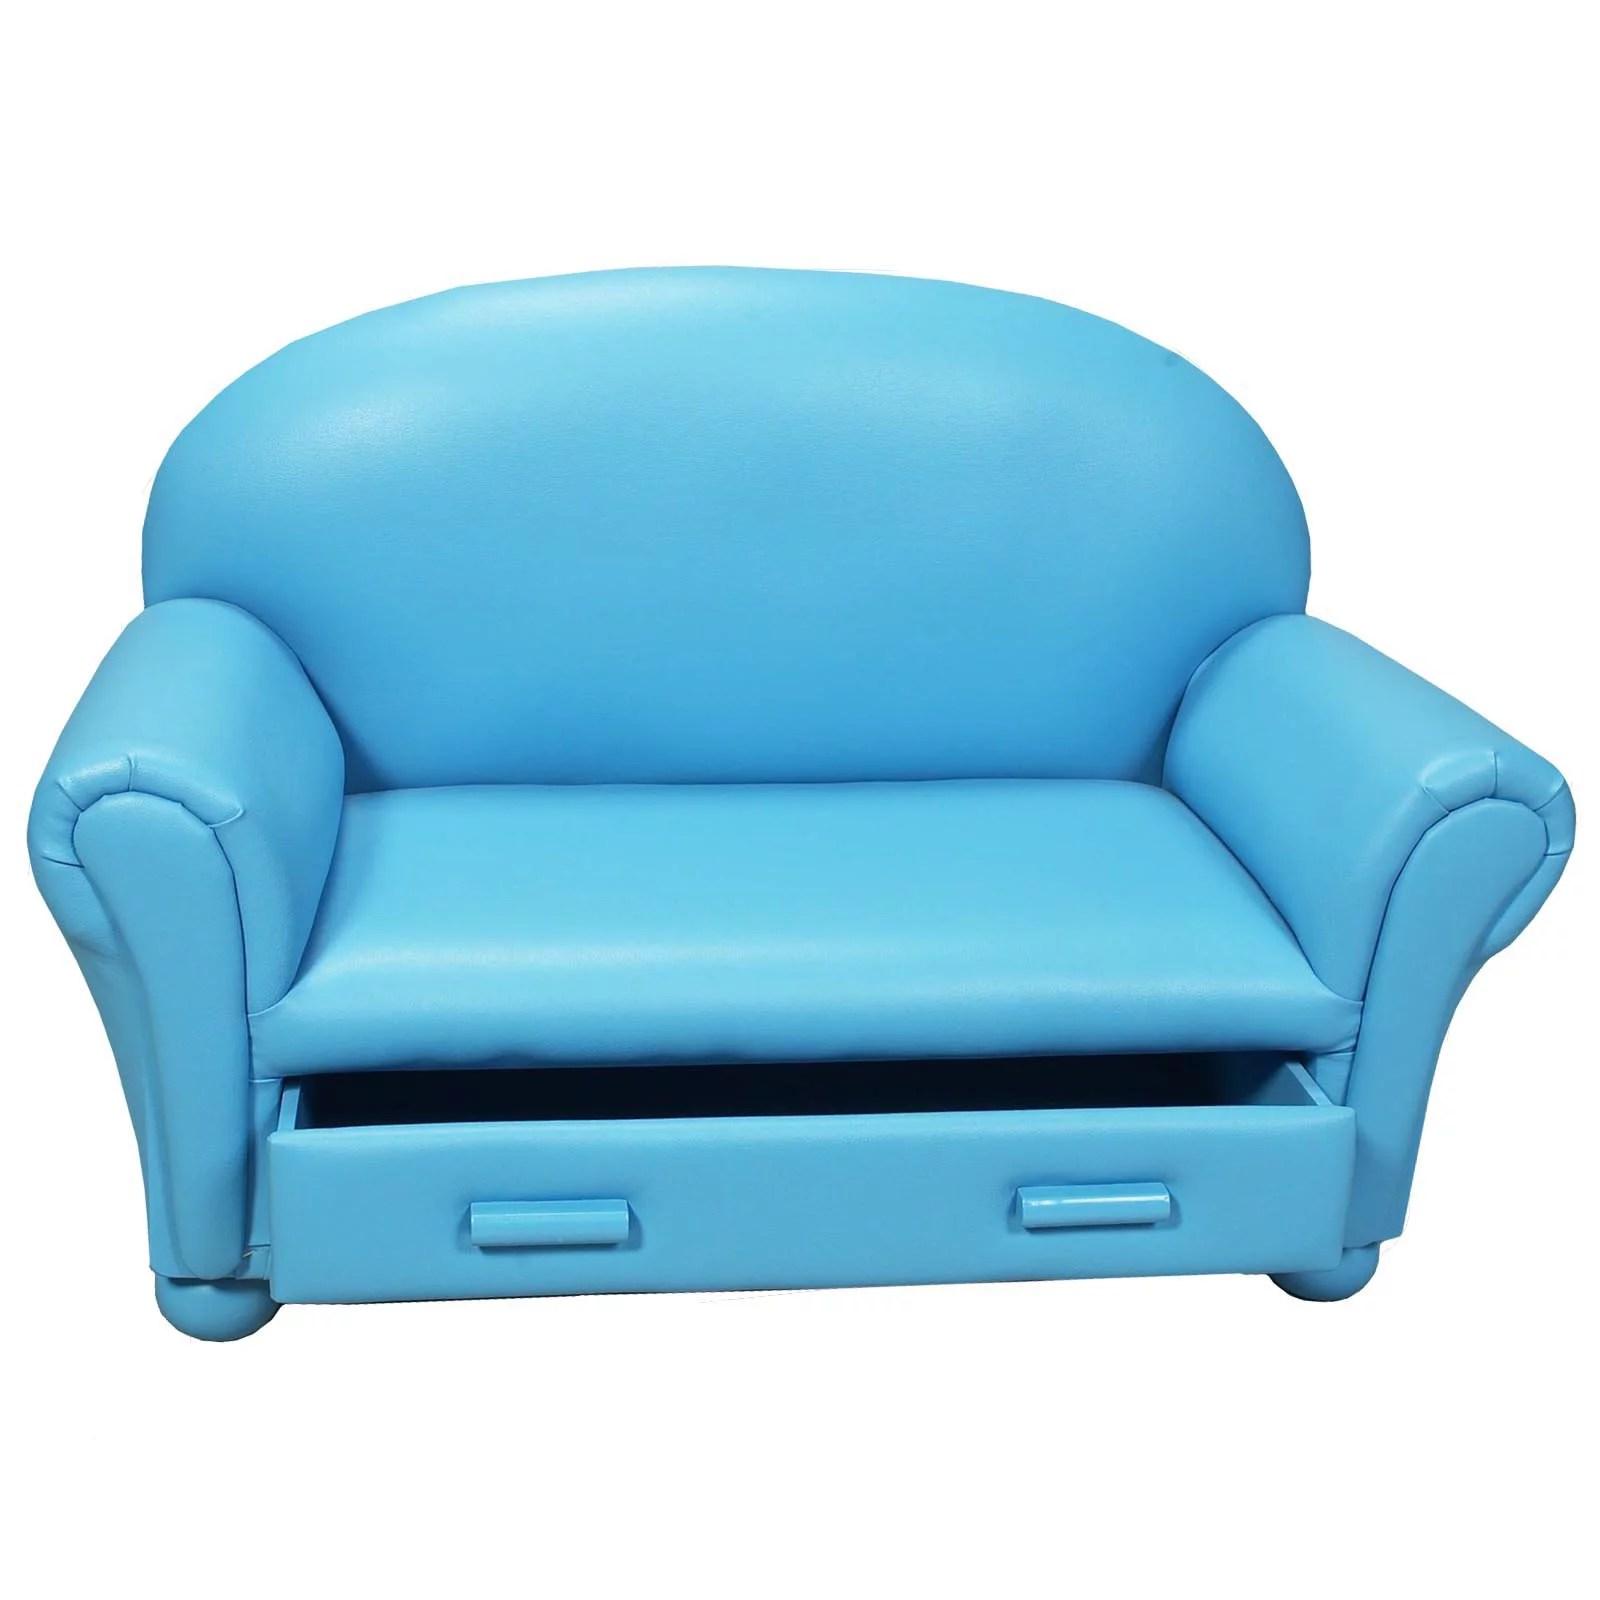 childrens sofa with storage drawer walmart com